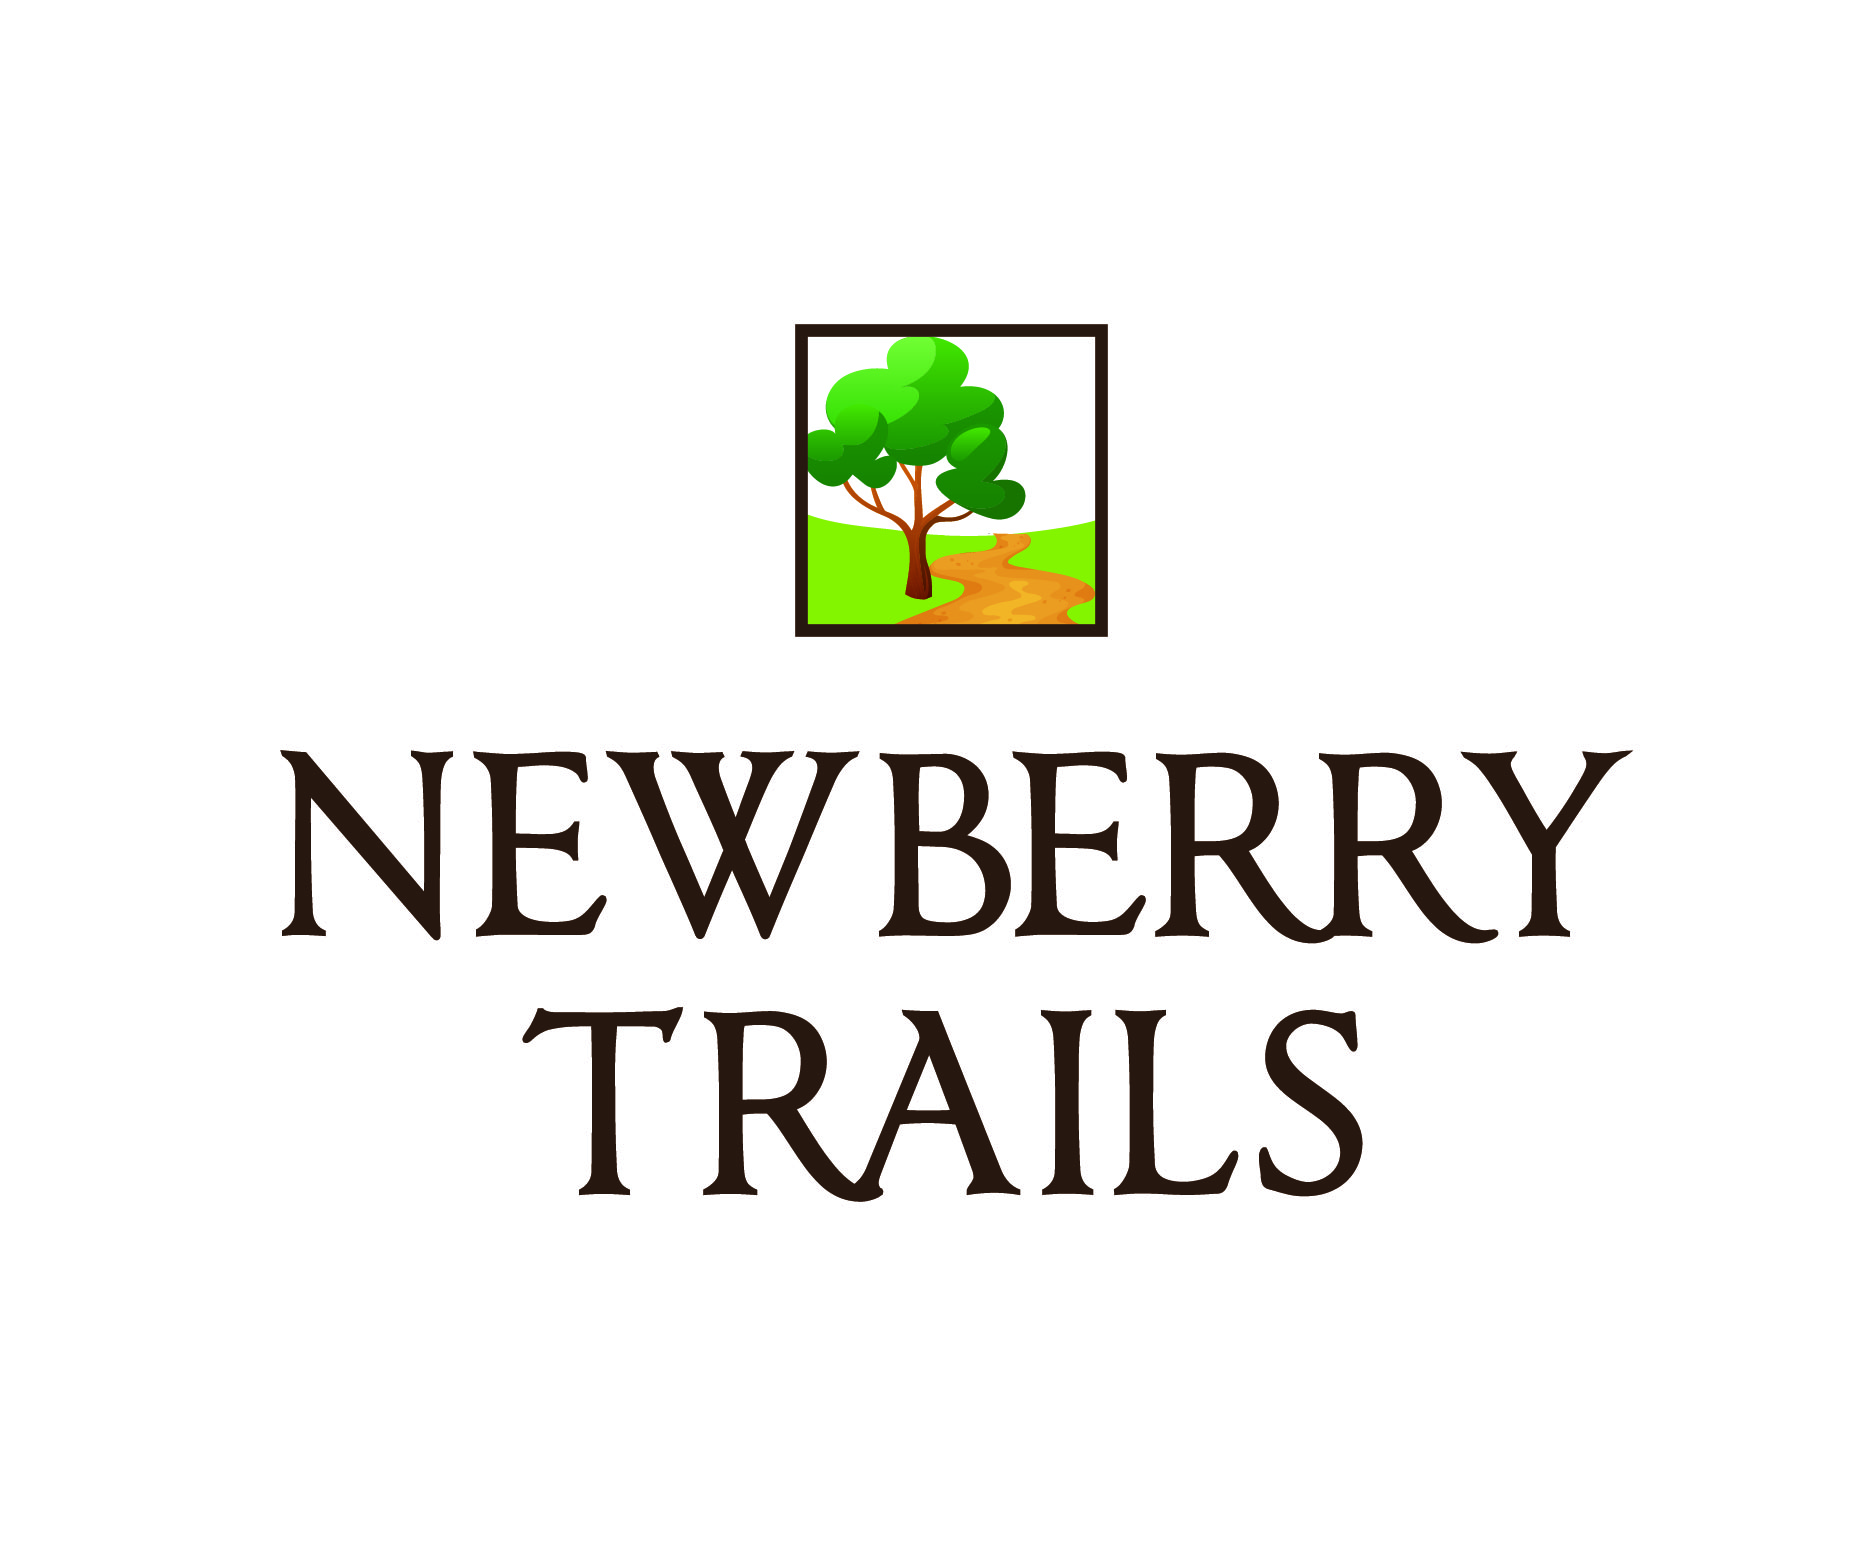 Newberry Trails